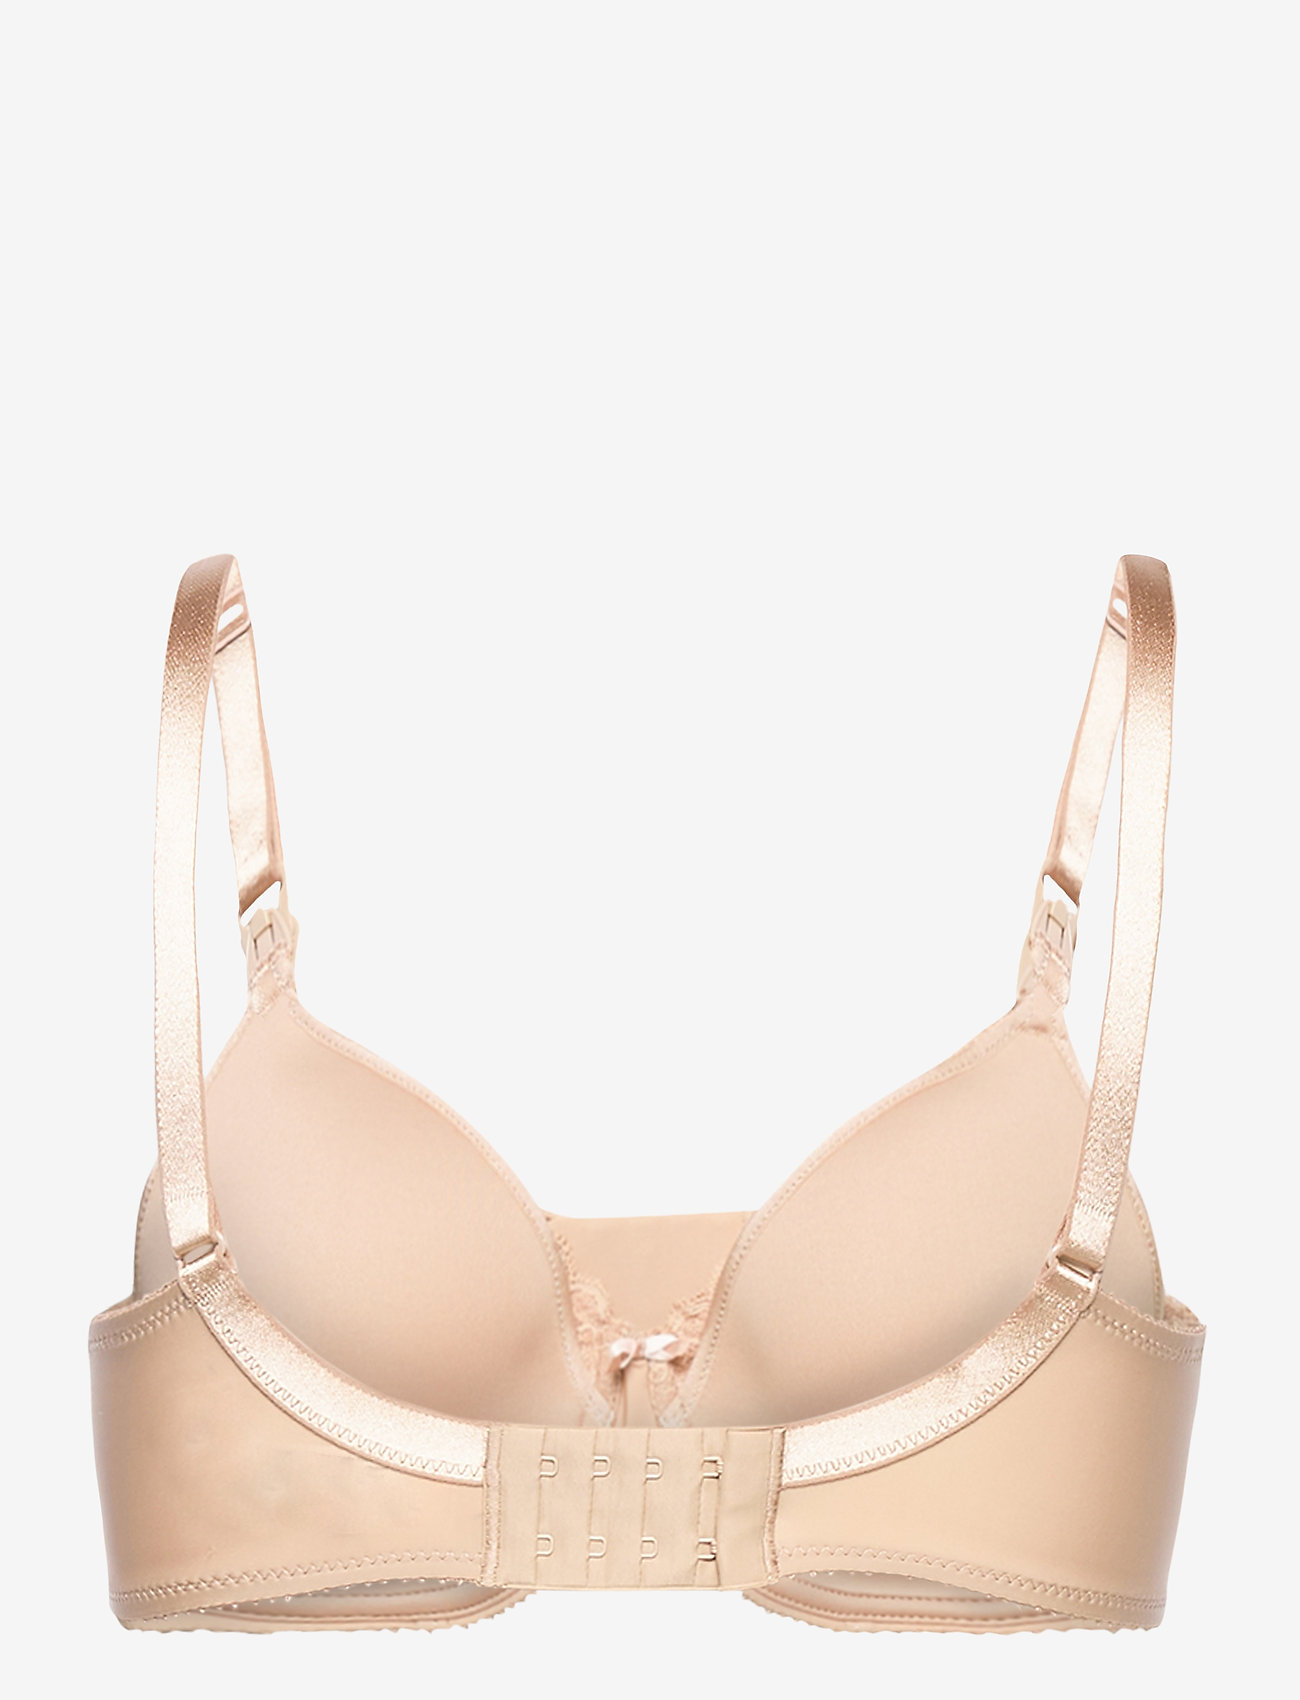 CHANTELLE - CO BRA SPE. MATERNITY - soutien-gorge emboîtant - perfect nude - 1